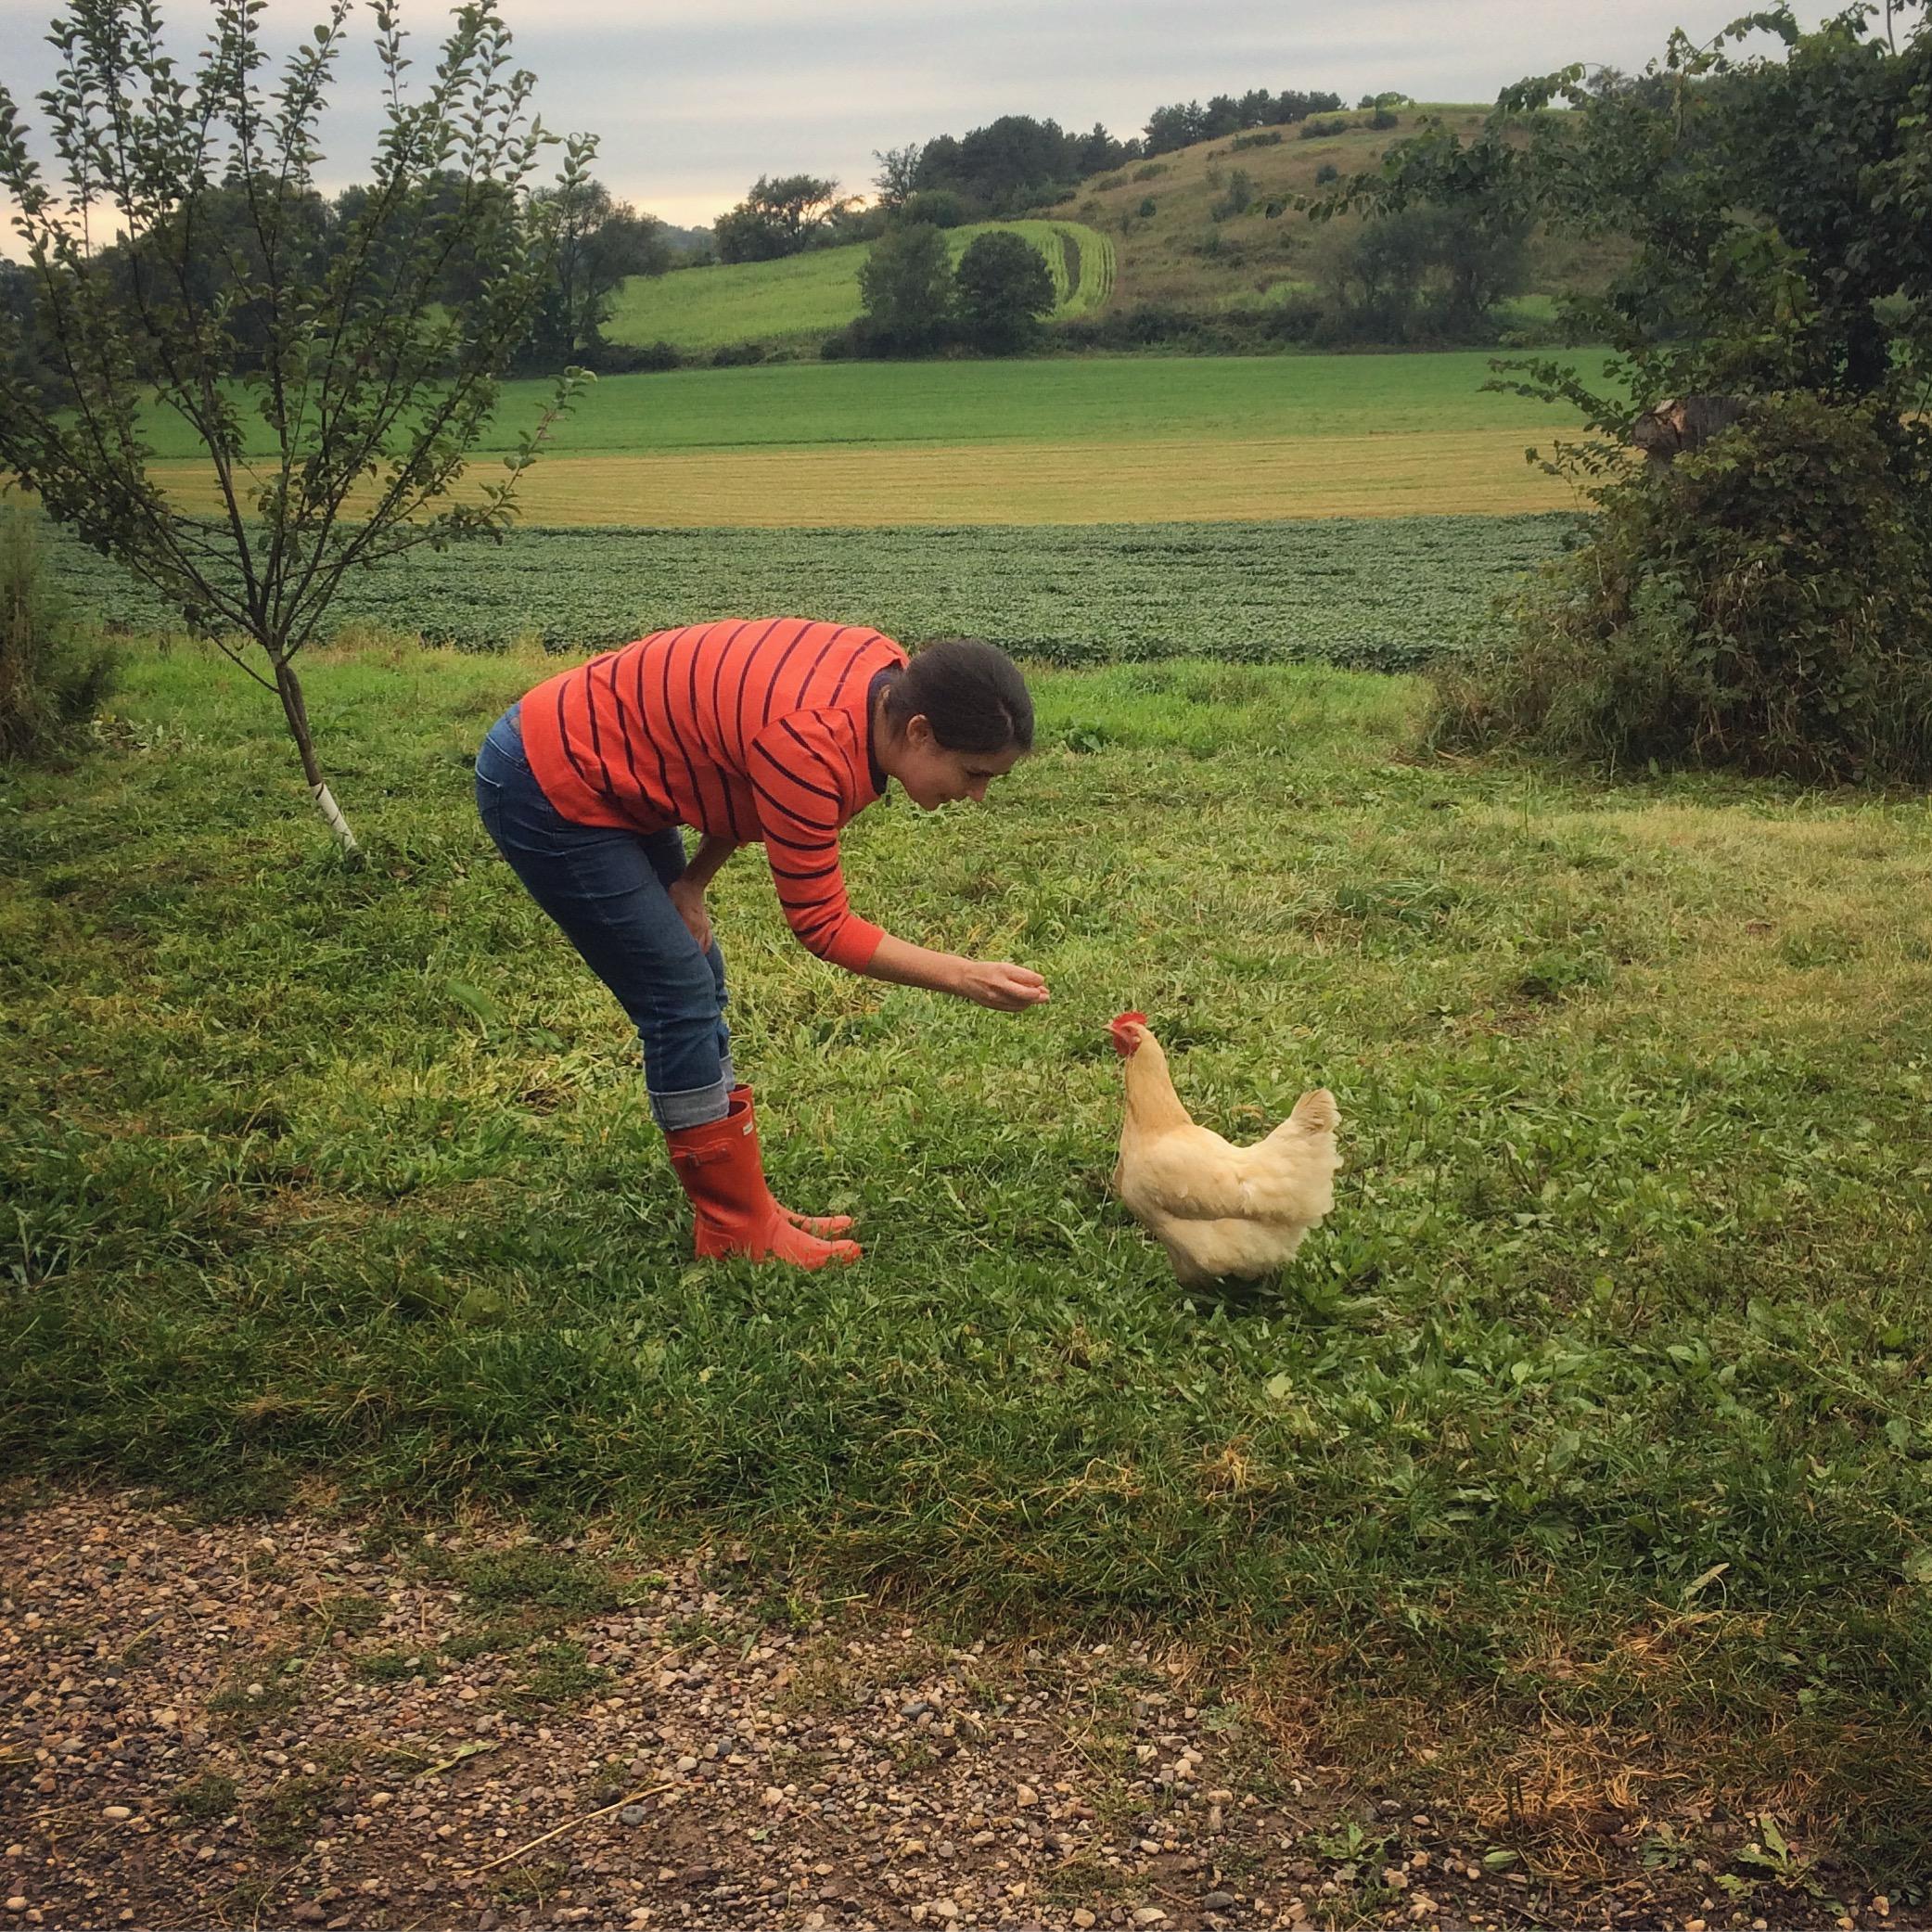 Not my chicken.